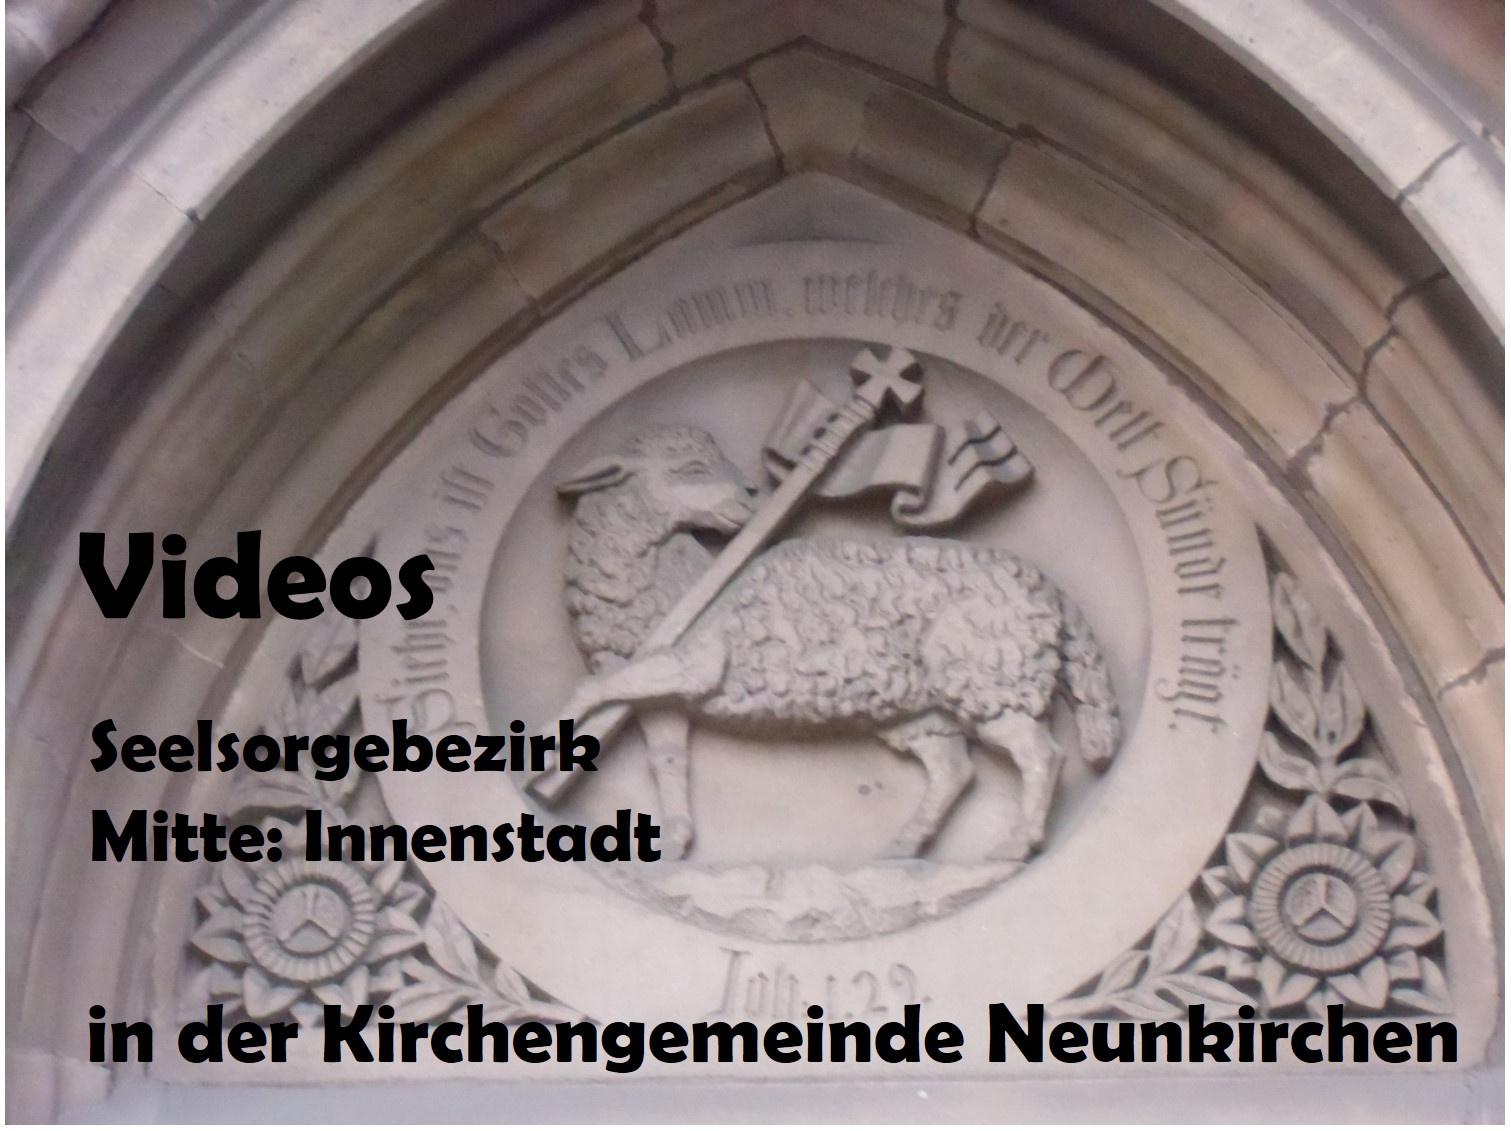 NK-Videos aus der Christuskirche